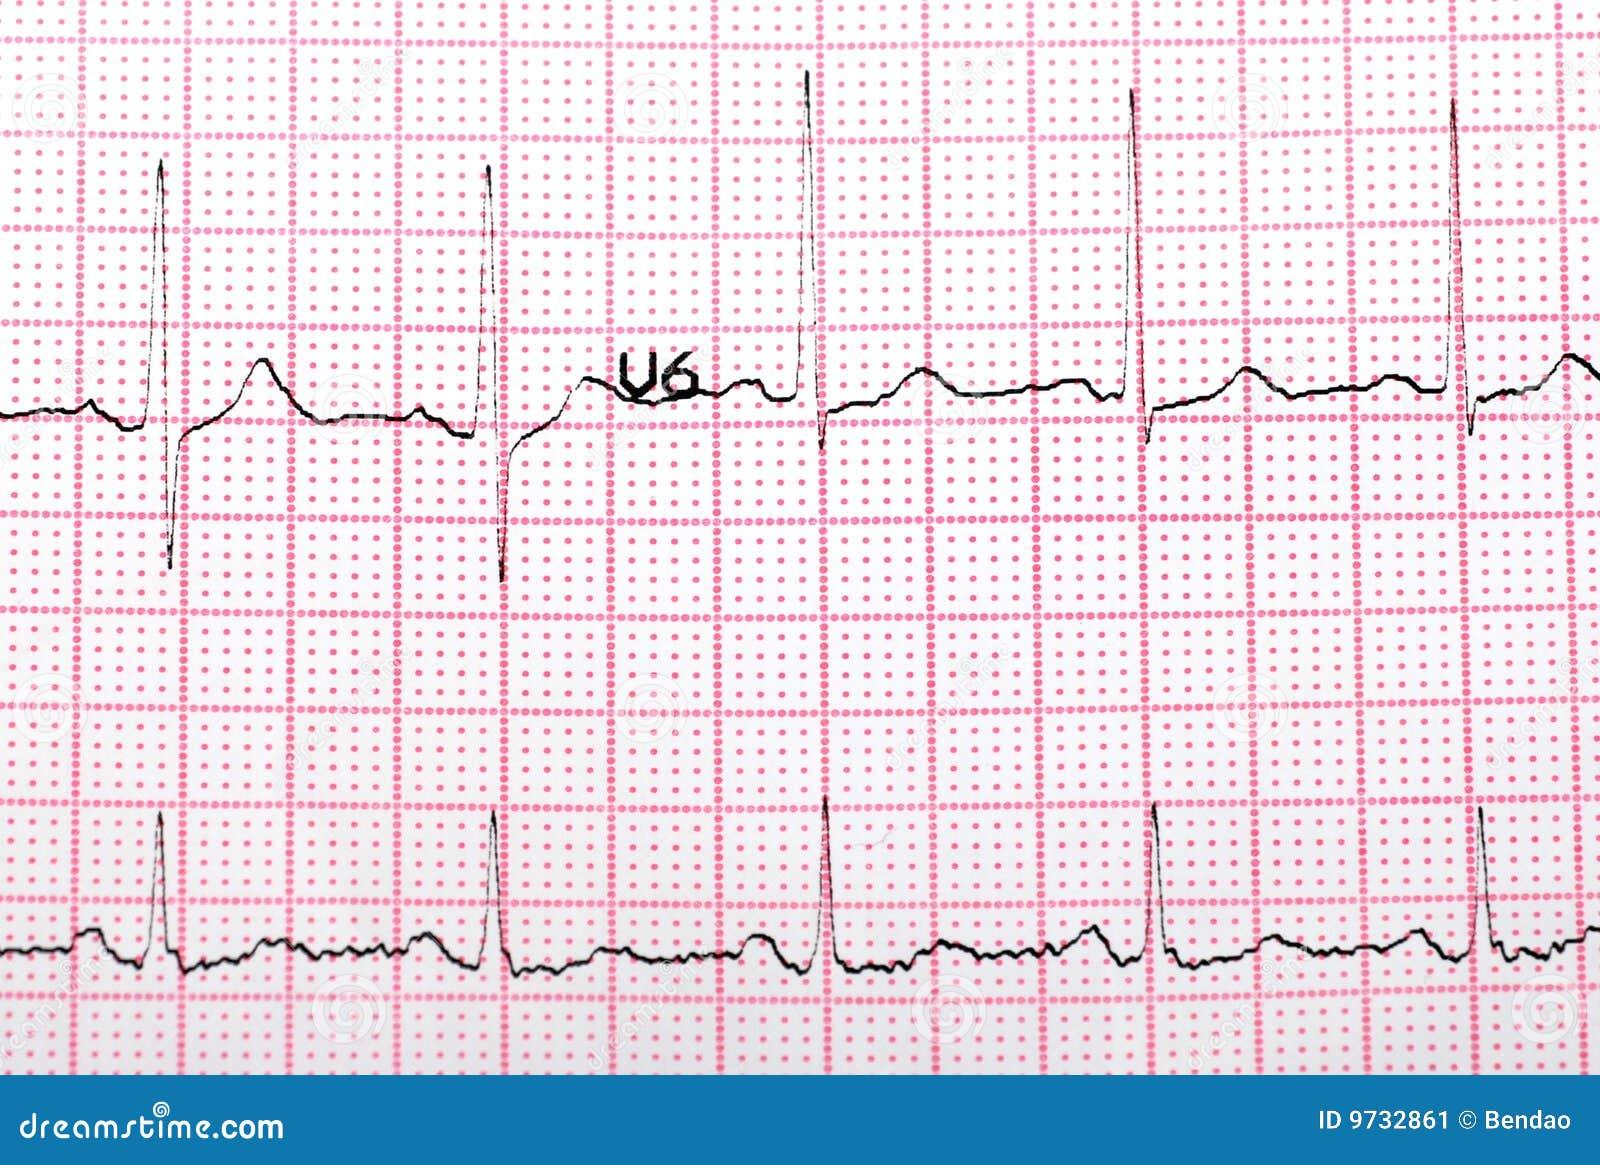 EKG PRINTOUT stockbild. Bild von konzept, inneres, kinetik - 9732861